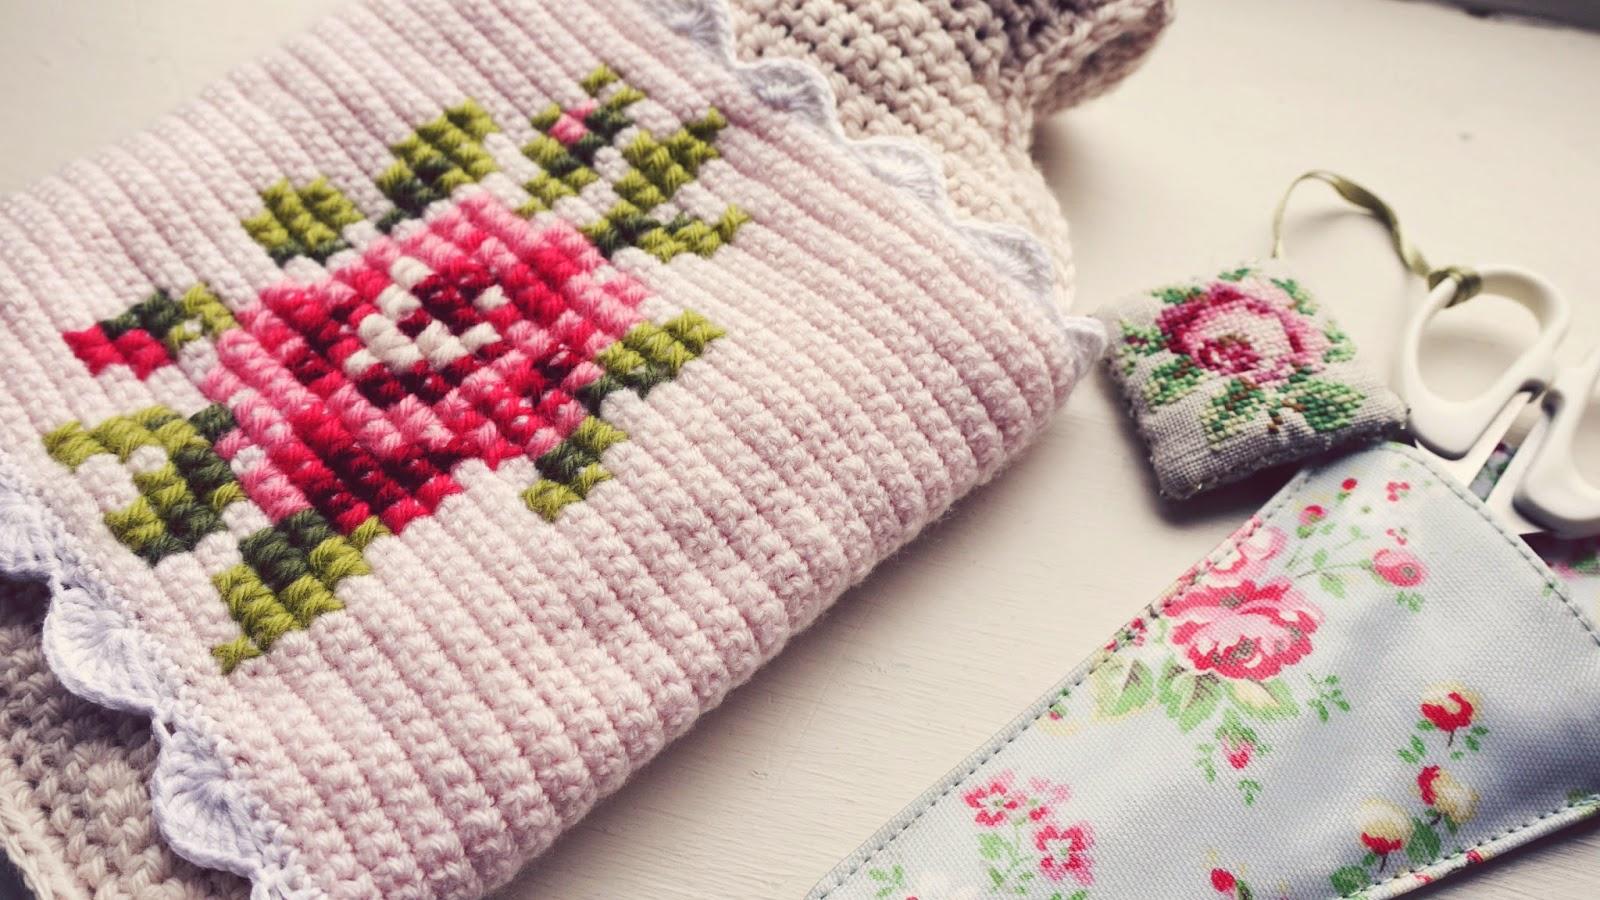 Porcupine Design: Crochet Hot Water Bottle Covers